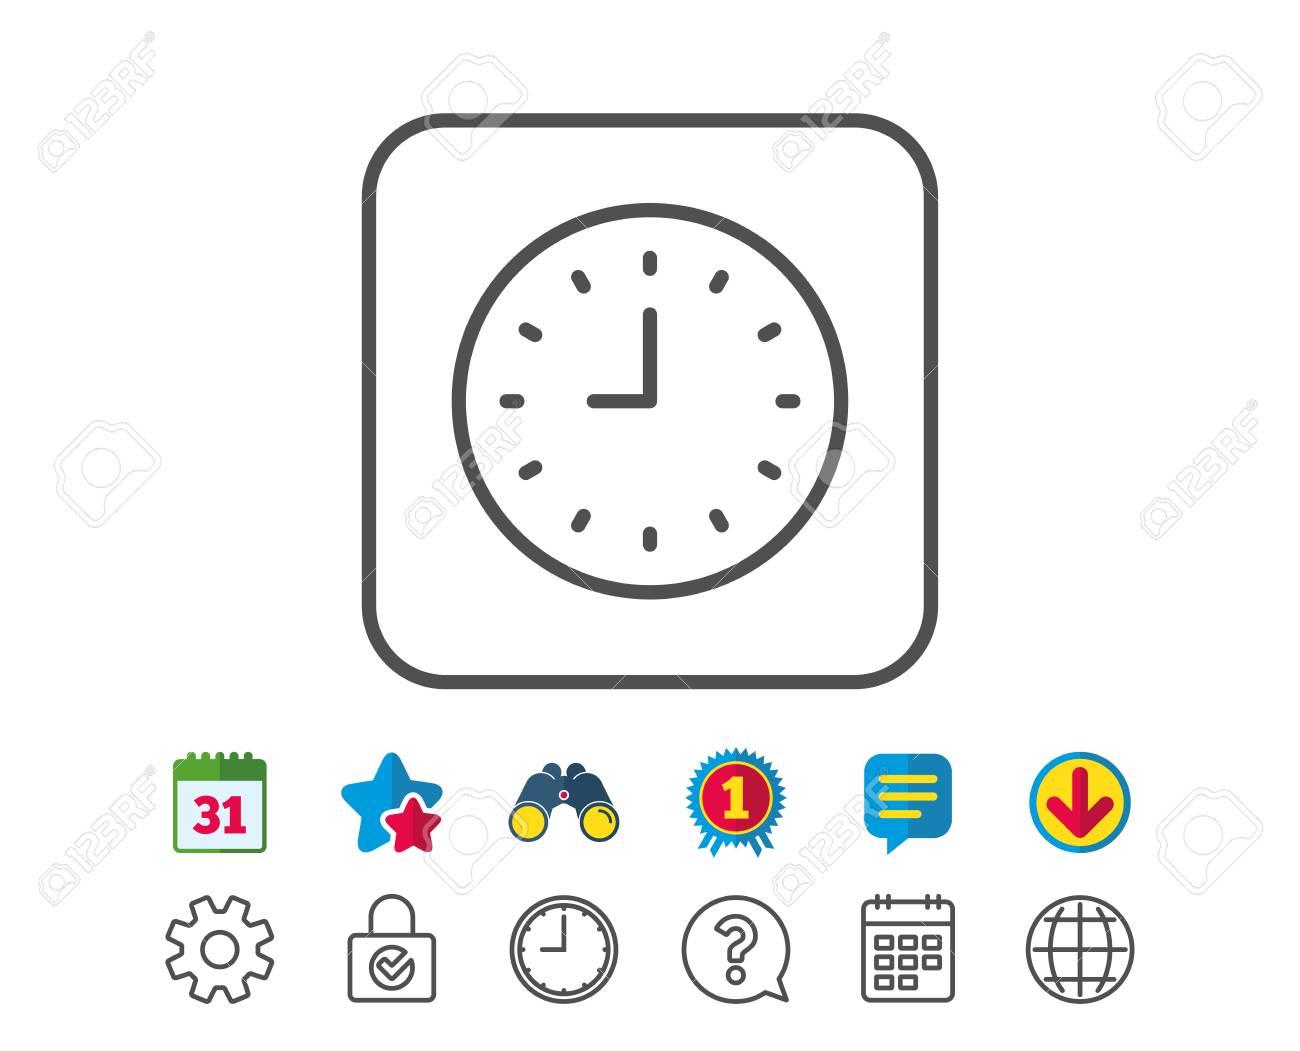 76fe6ea0572e Icono De Línea De Reloj. Signo De Tiempo Reloj De Office O Símbolo Del  Temporizador. Signos De Línea De Calendario